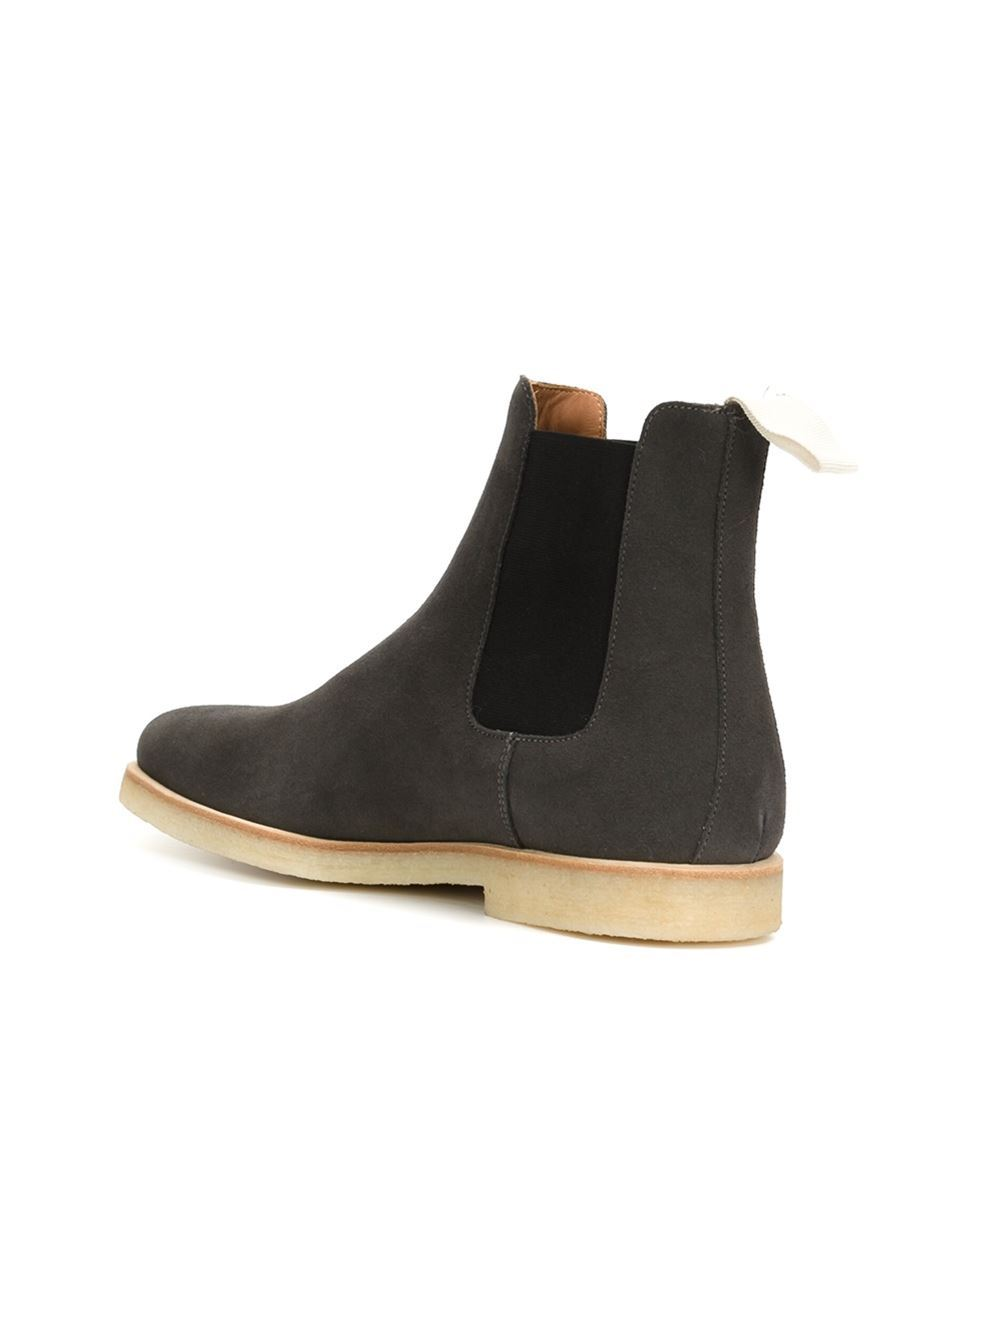 Handmade mens Dark gray Chelsea boot, Mens Gray crepe sole boots, Boots for men